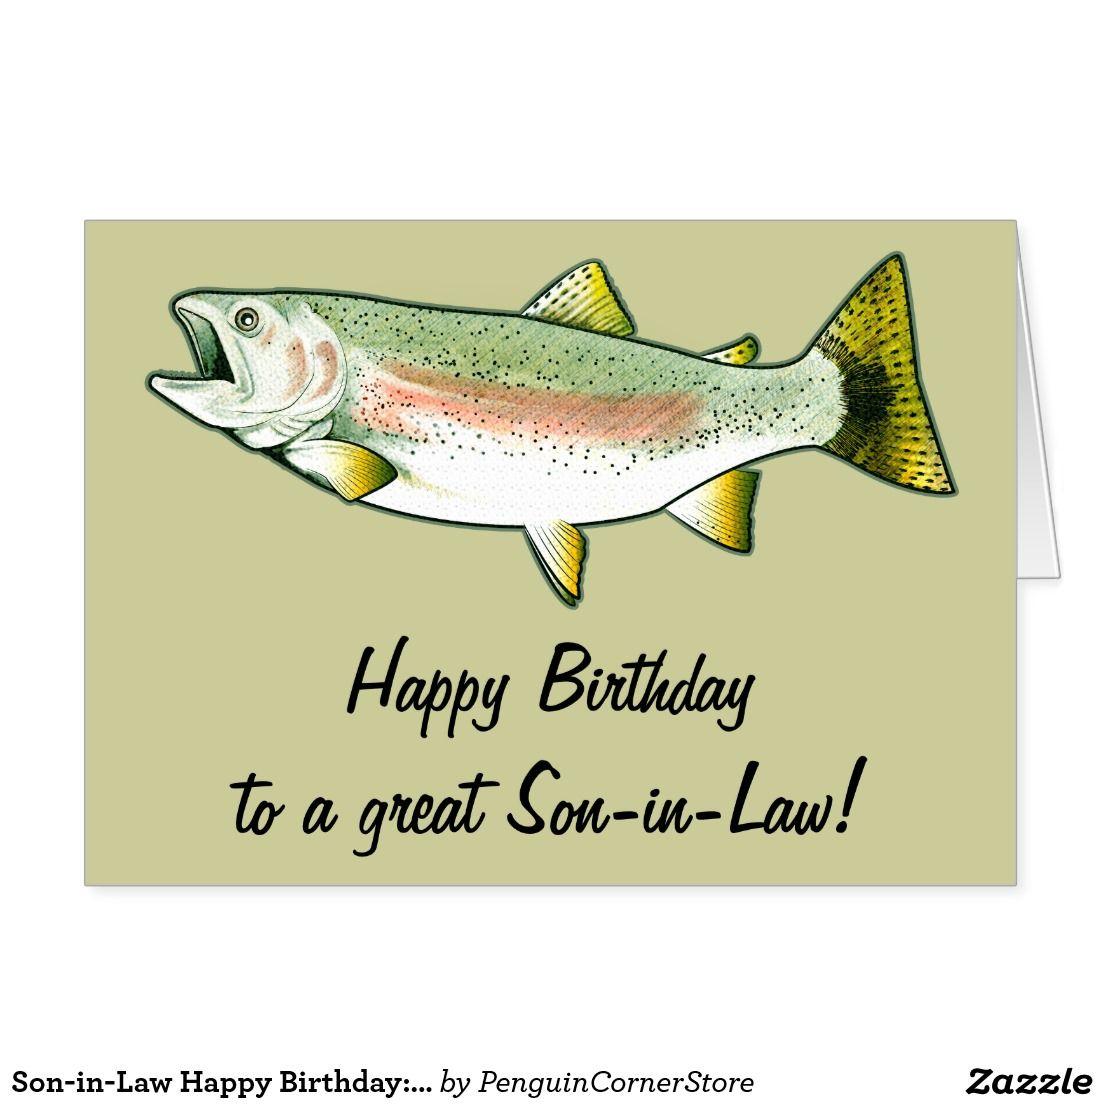 Son In Law Happy Birthday Rainbow Trout Card Zazzle Com Birthday Verses For Cards Happy Birthday Son Happy Birthday Name